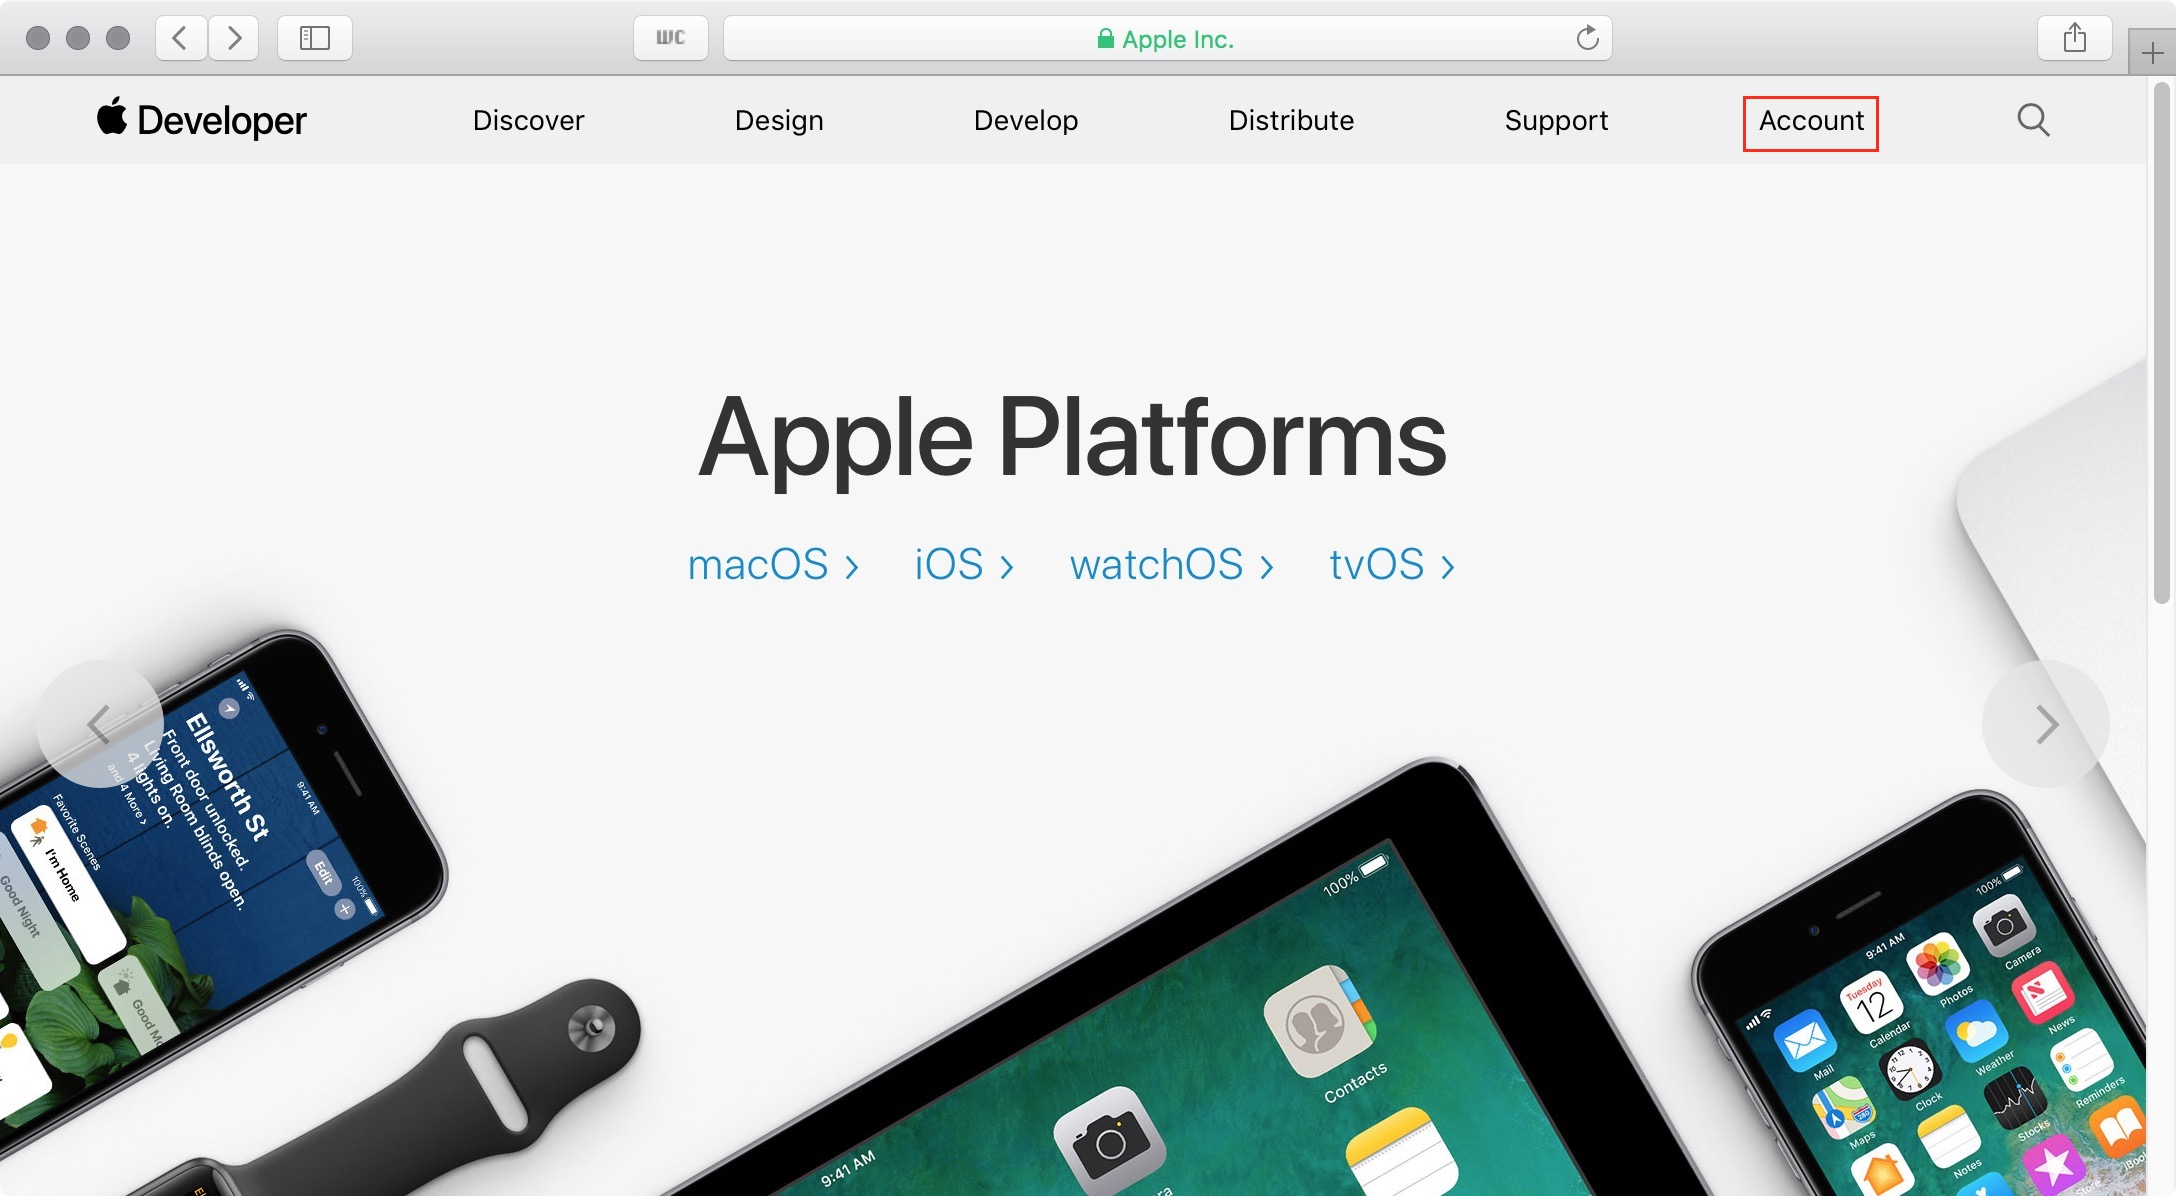 figure #1: Apple Developer Homepage